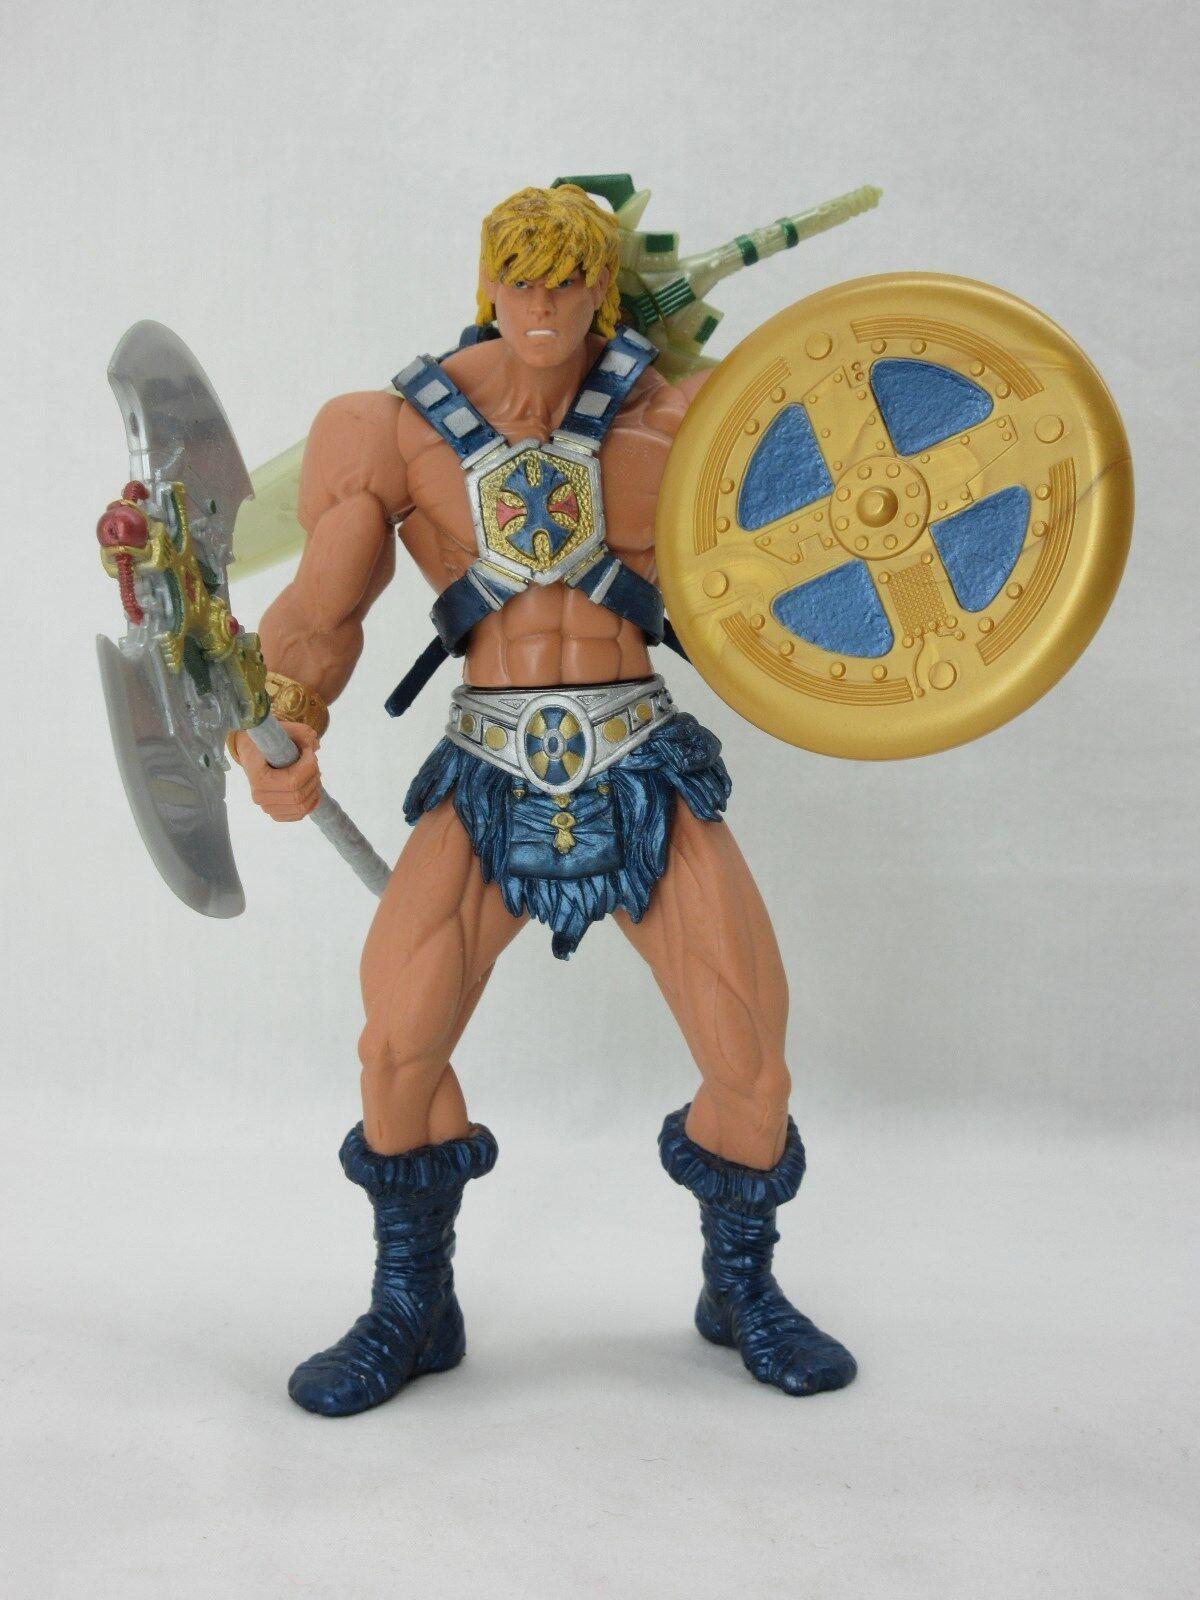 MOTU,HE-MAN,200x,figure,Sword,Shield,Ax,Masters of the Universe,He Man